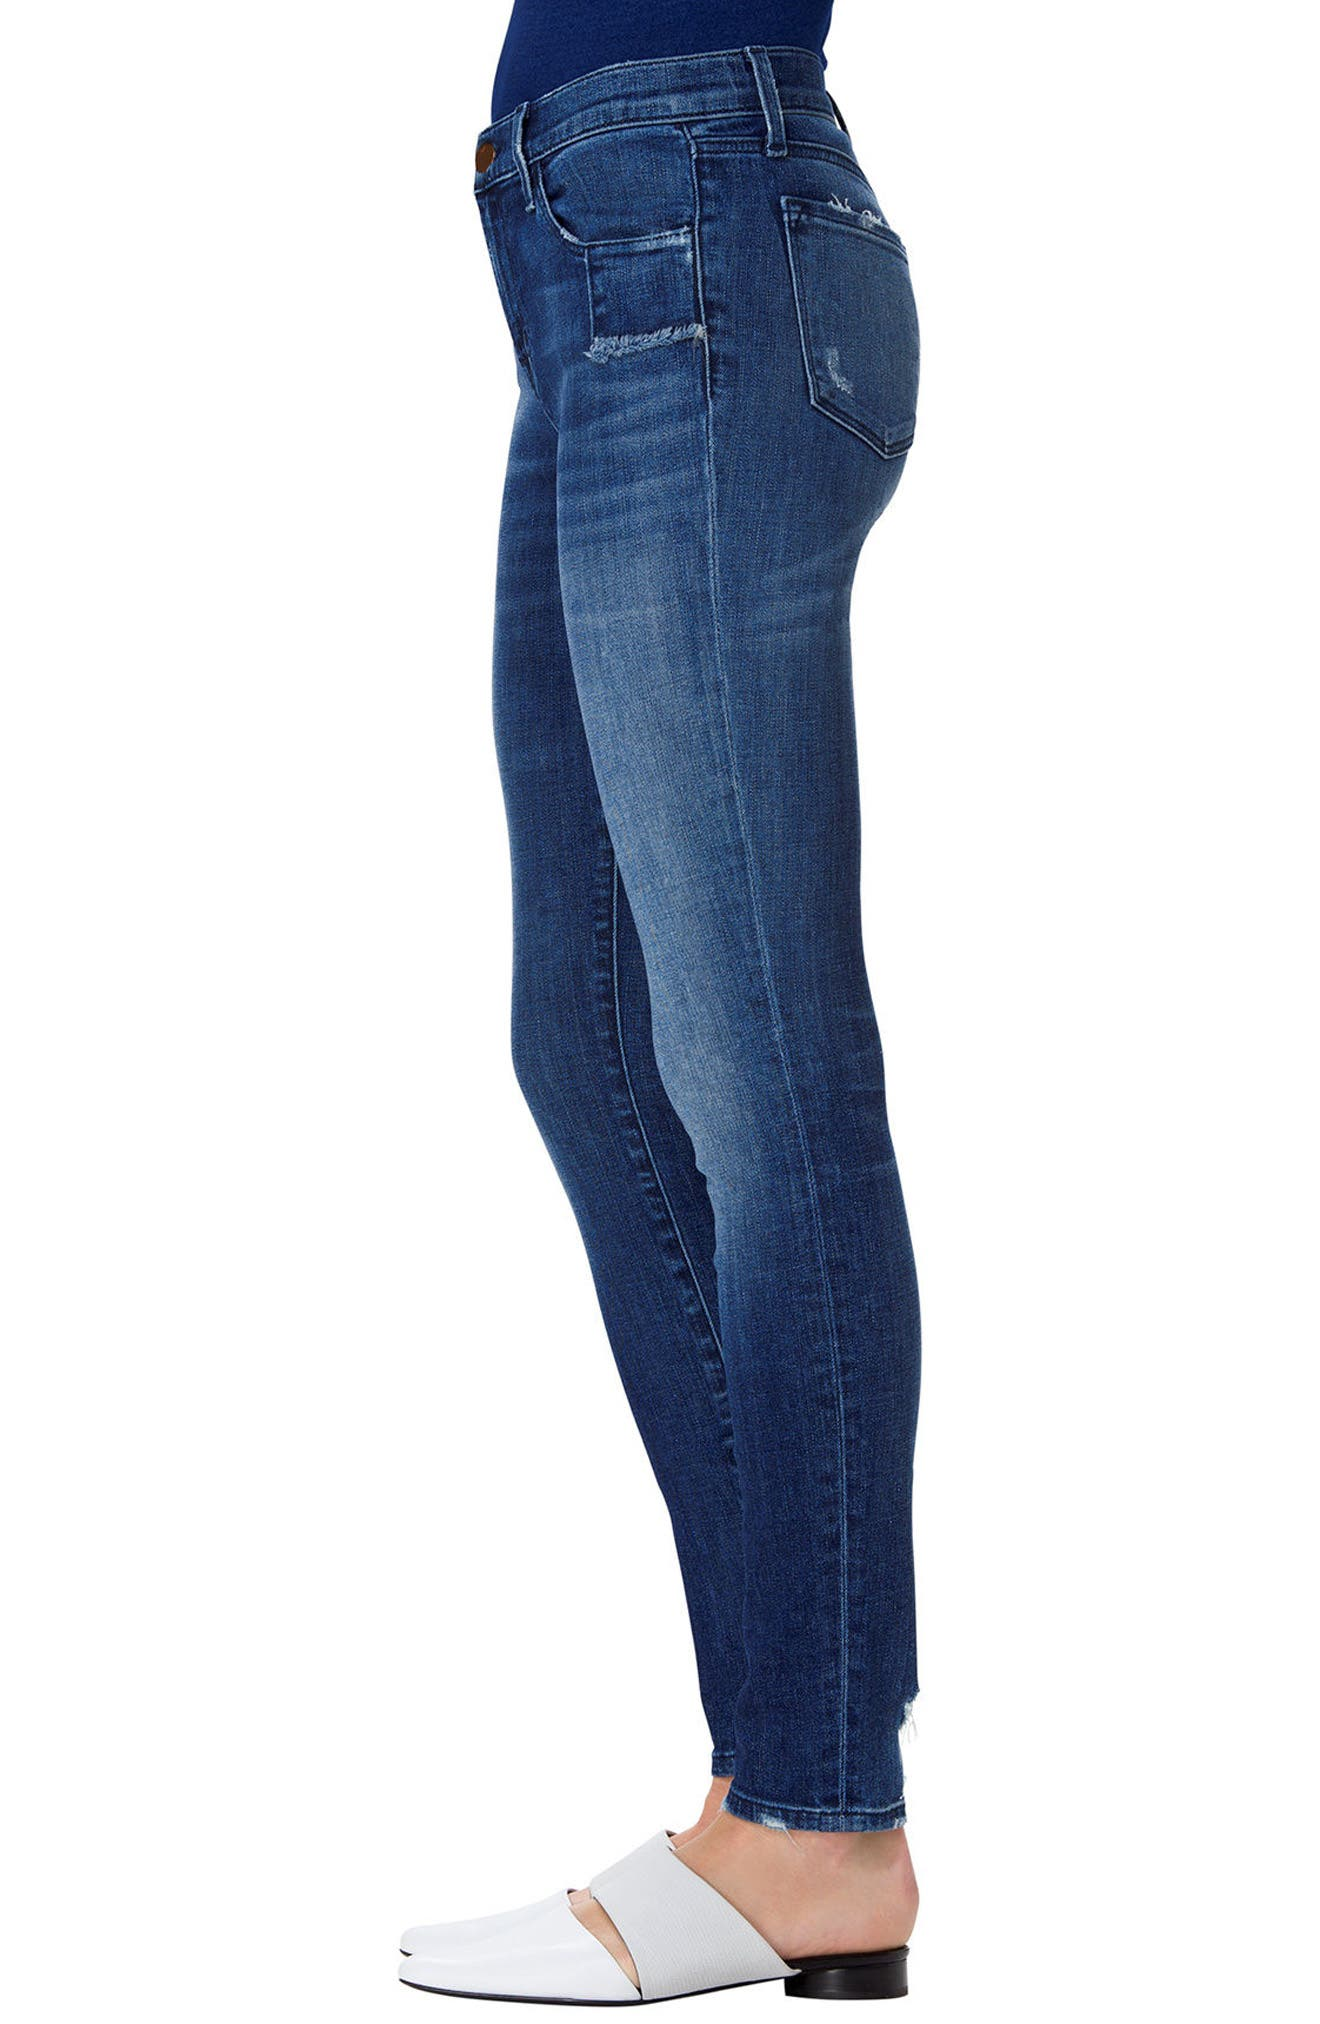 620 Skinny Jeans,                             Alternate thumbnail 3, color,                             470